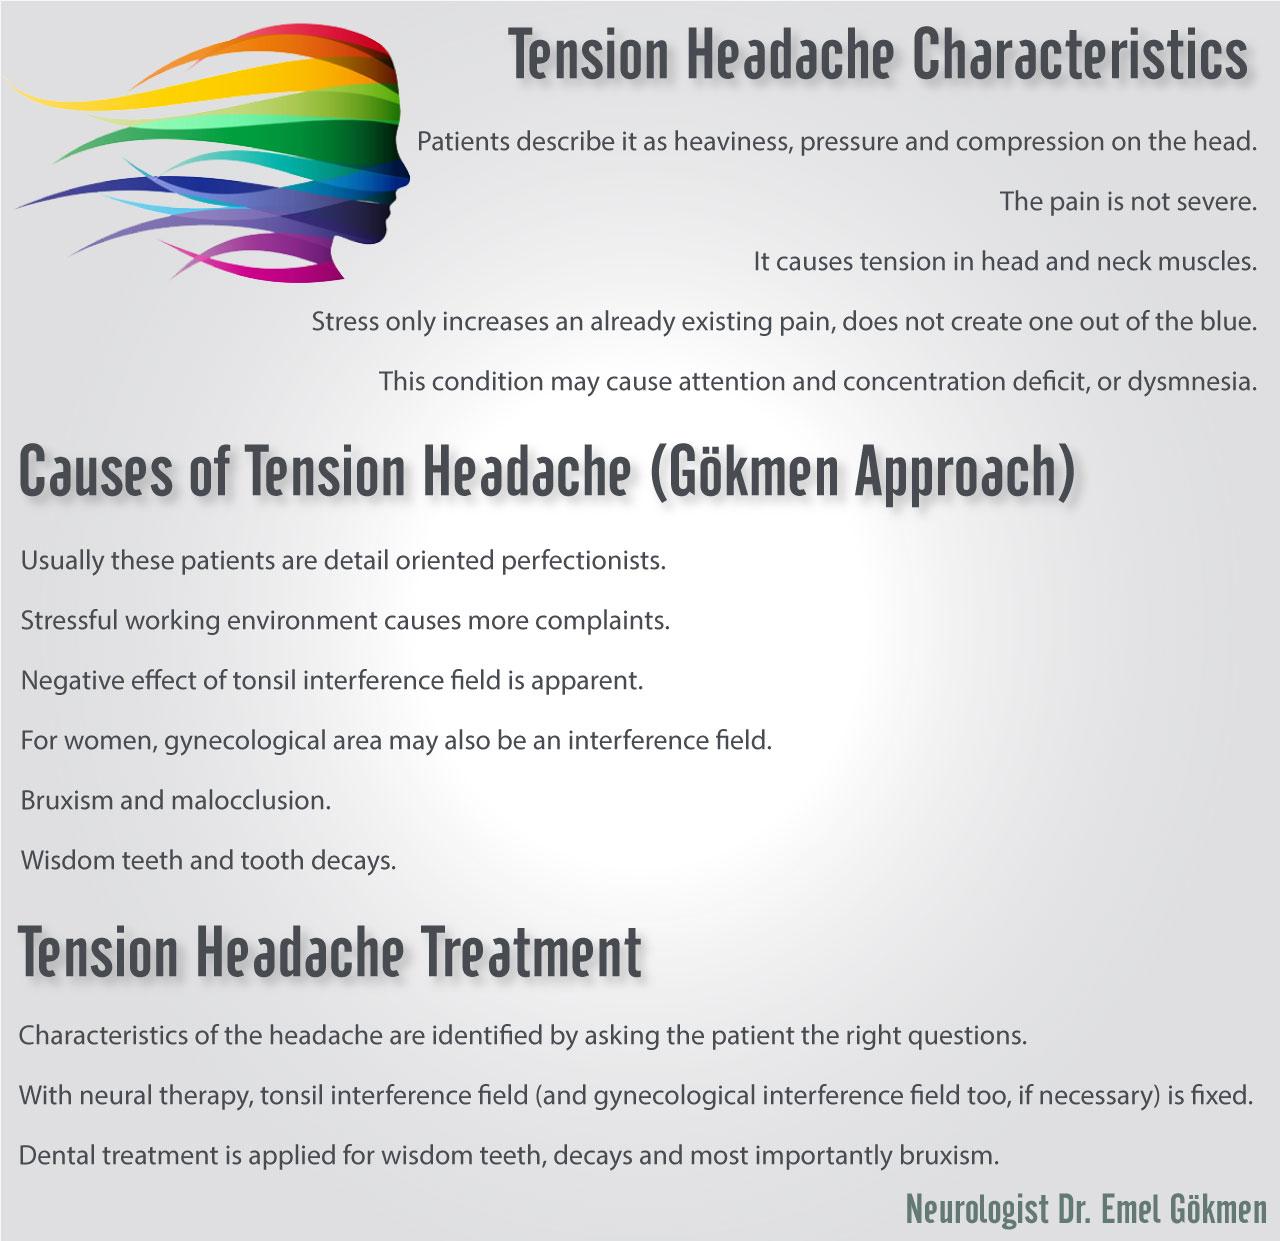 Tension headache infographic Dr. Emel Gokmen